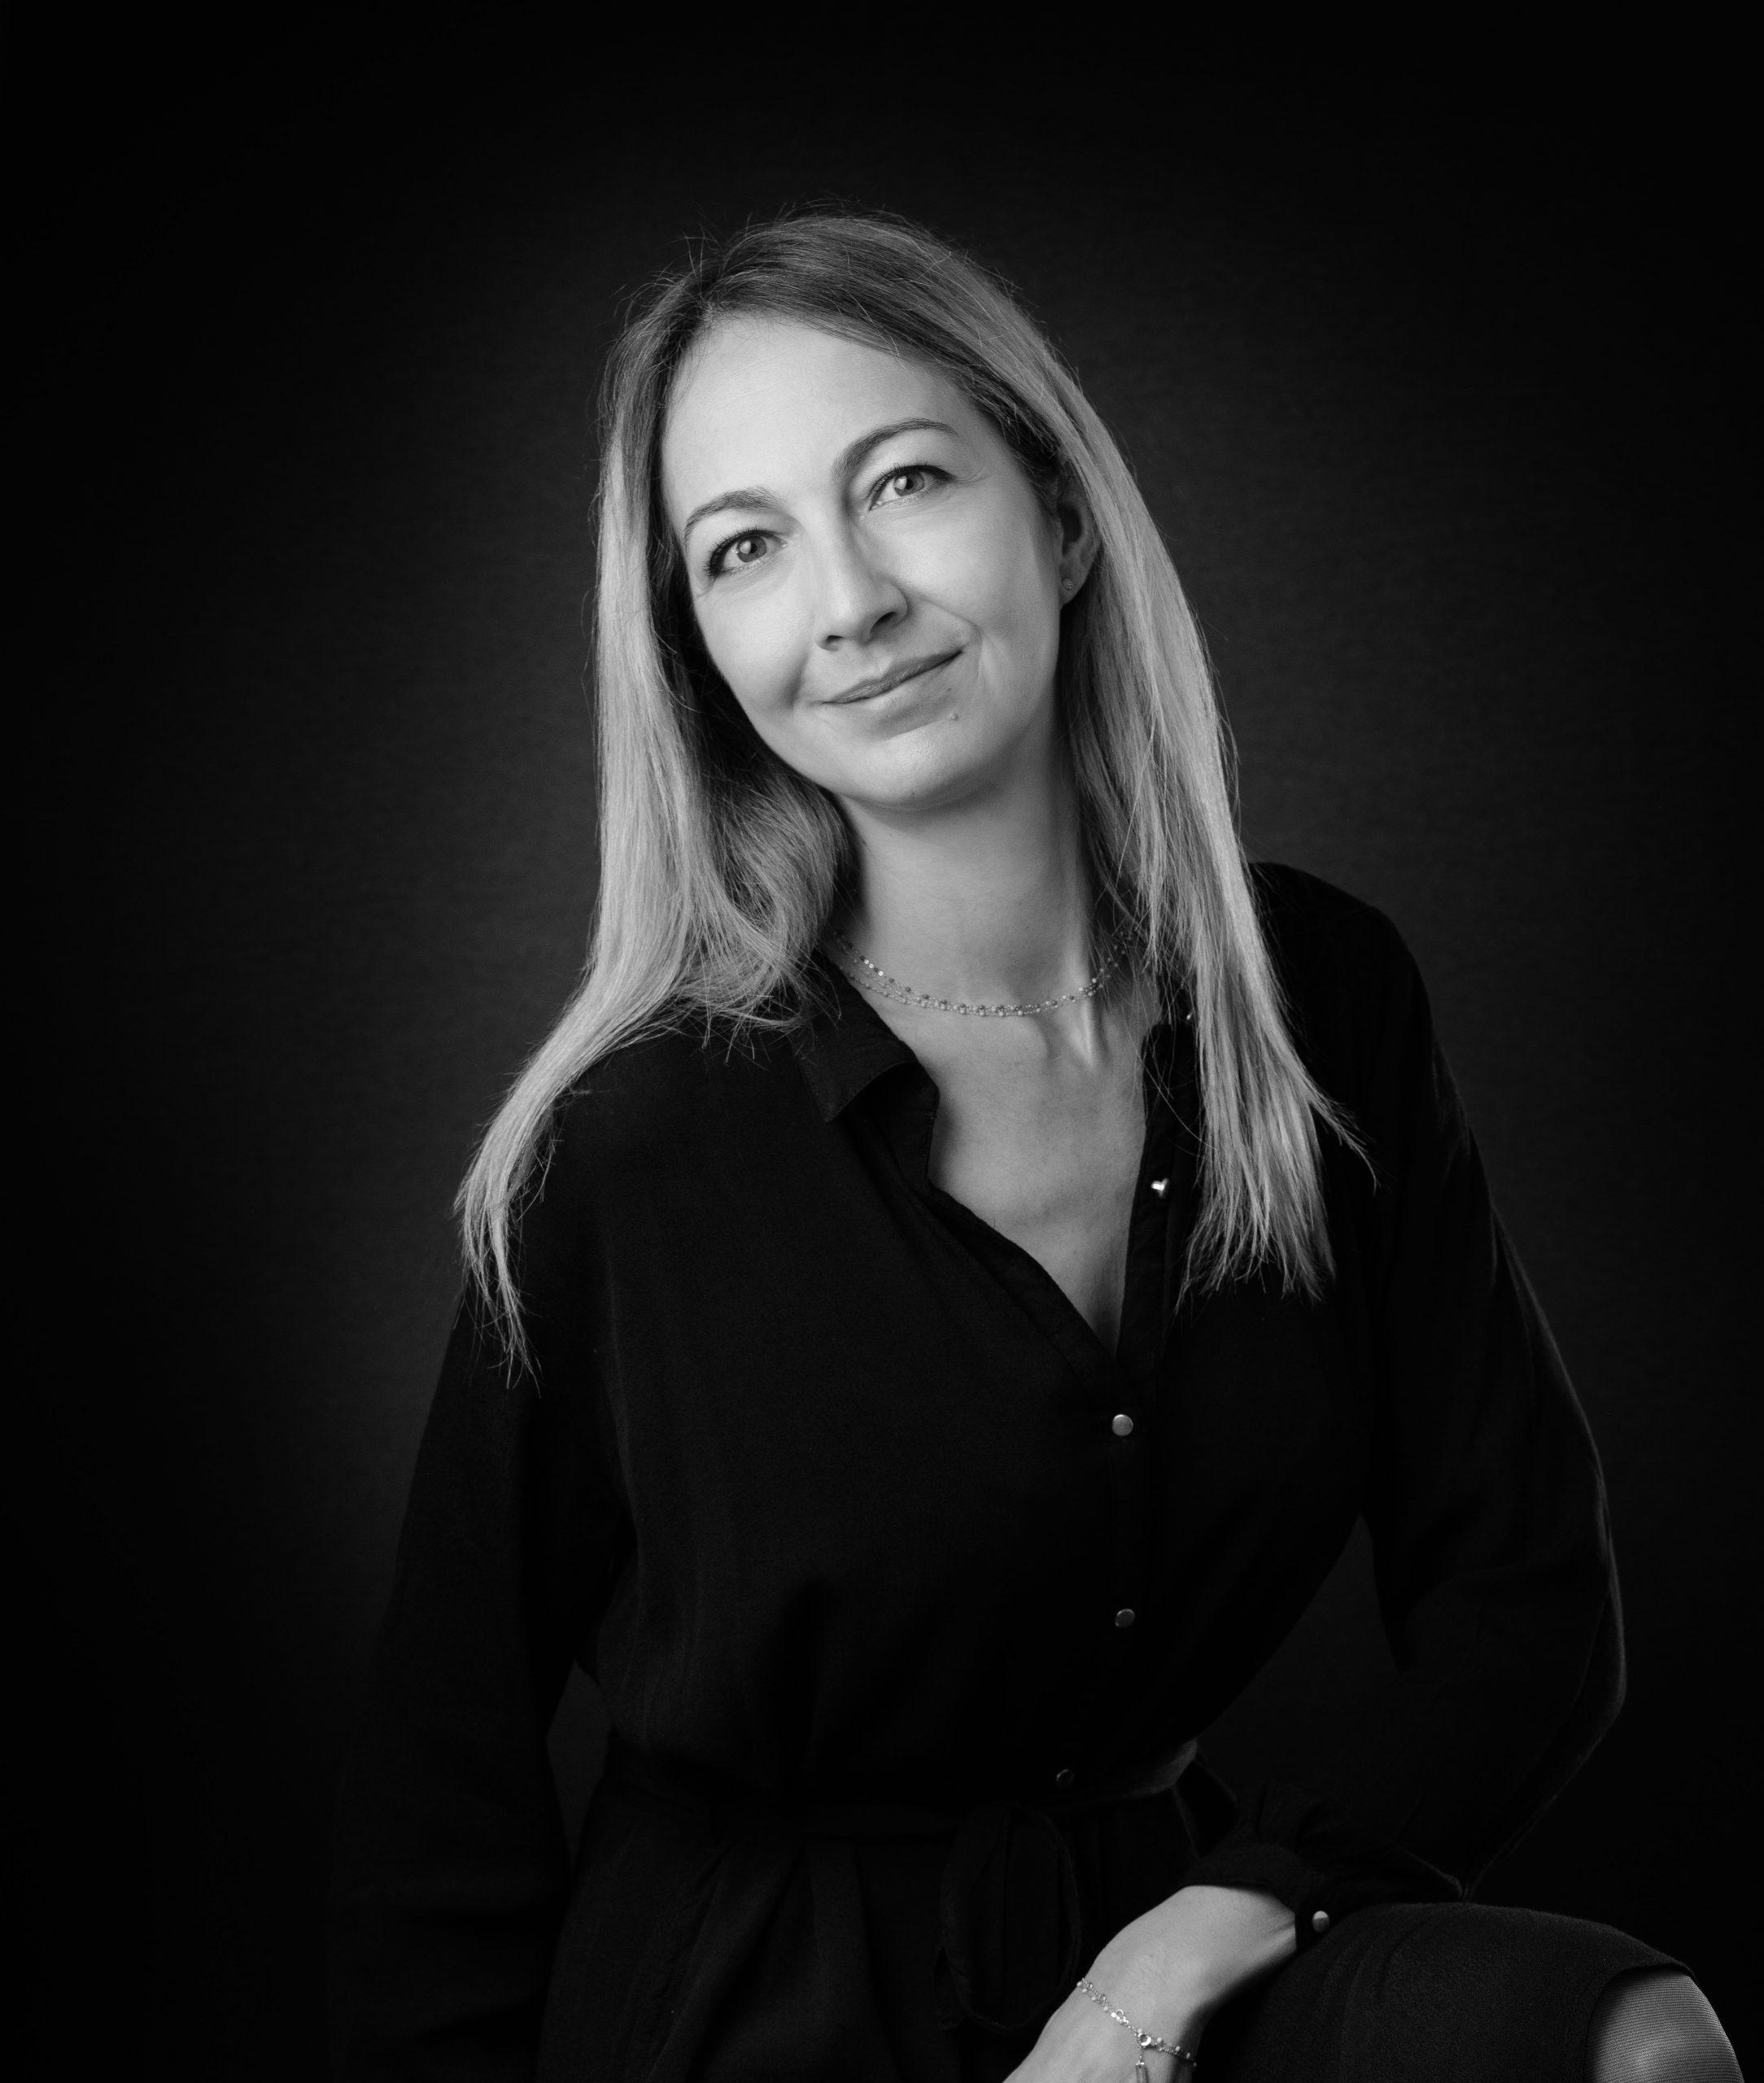 Alexandra Balesi-Romanacce